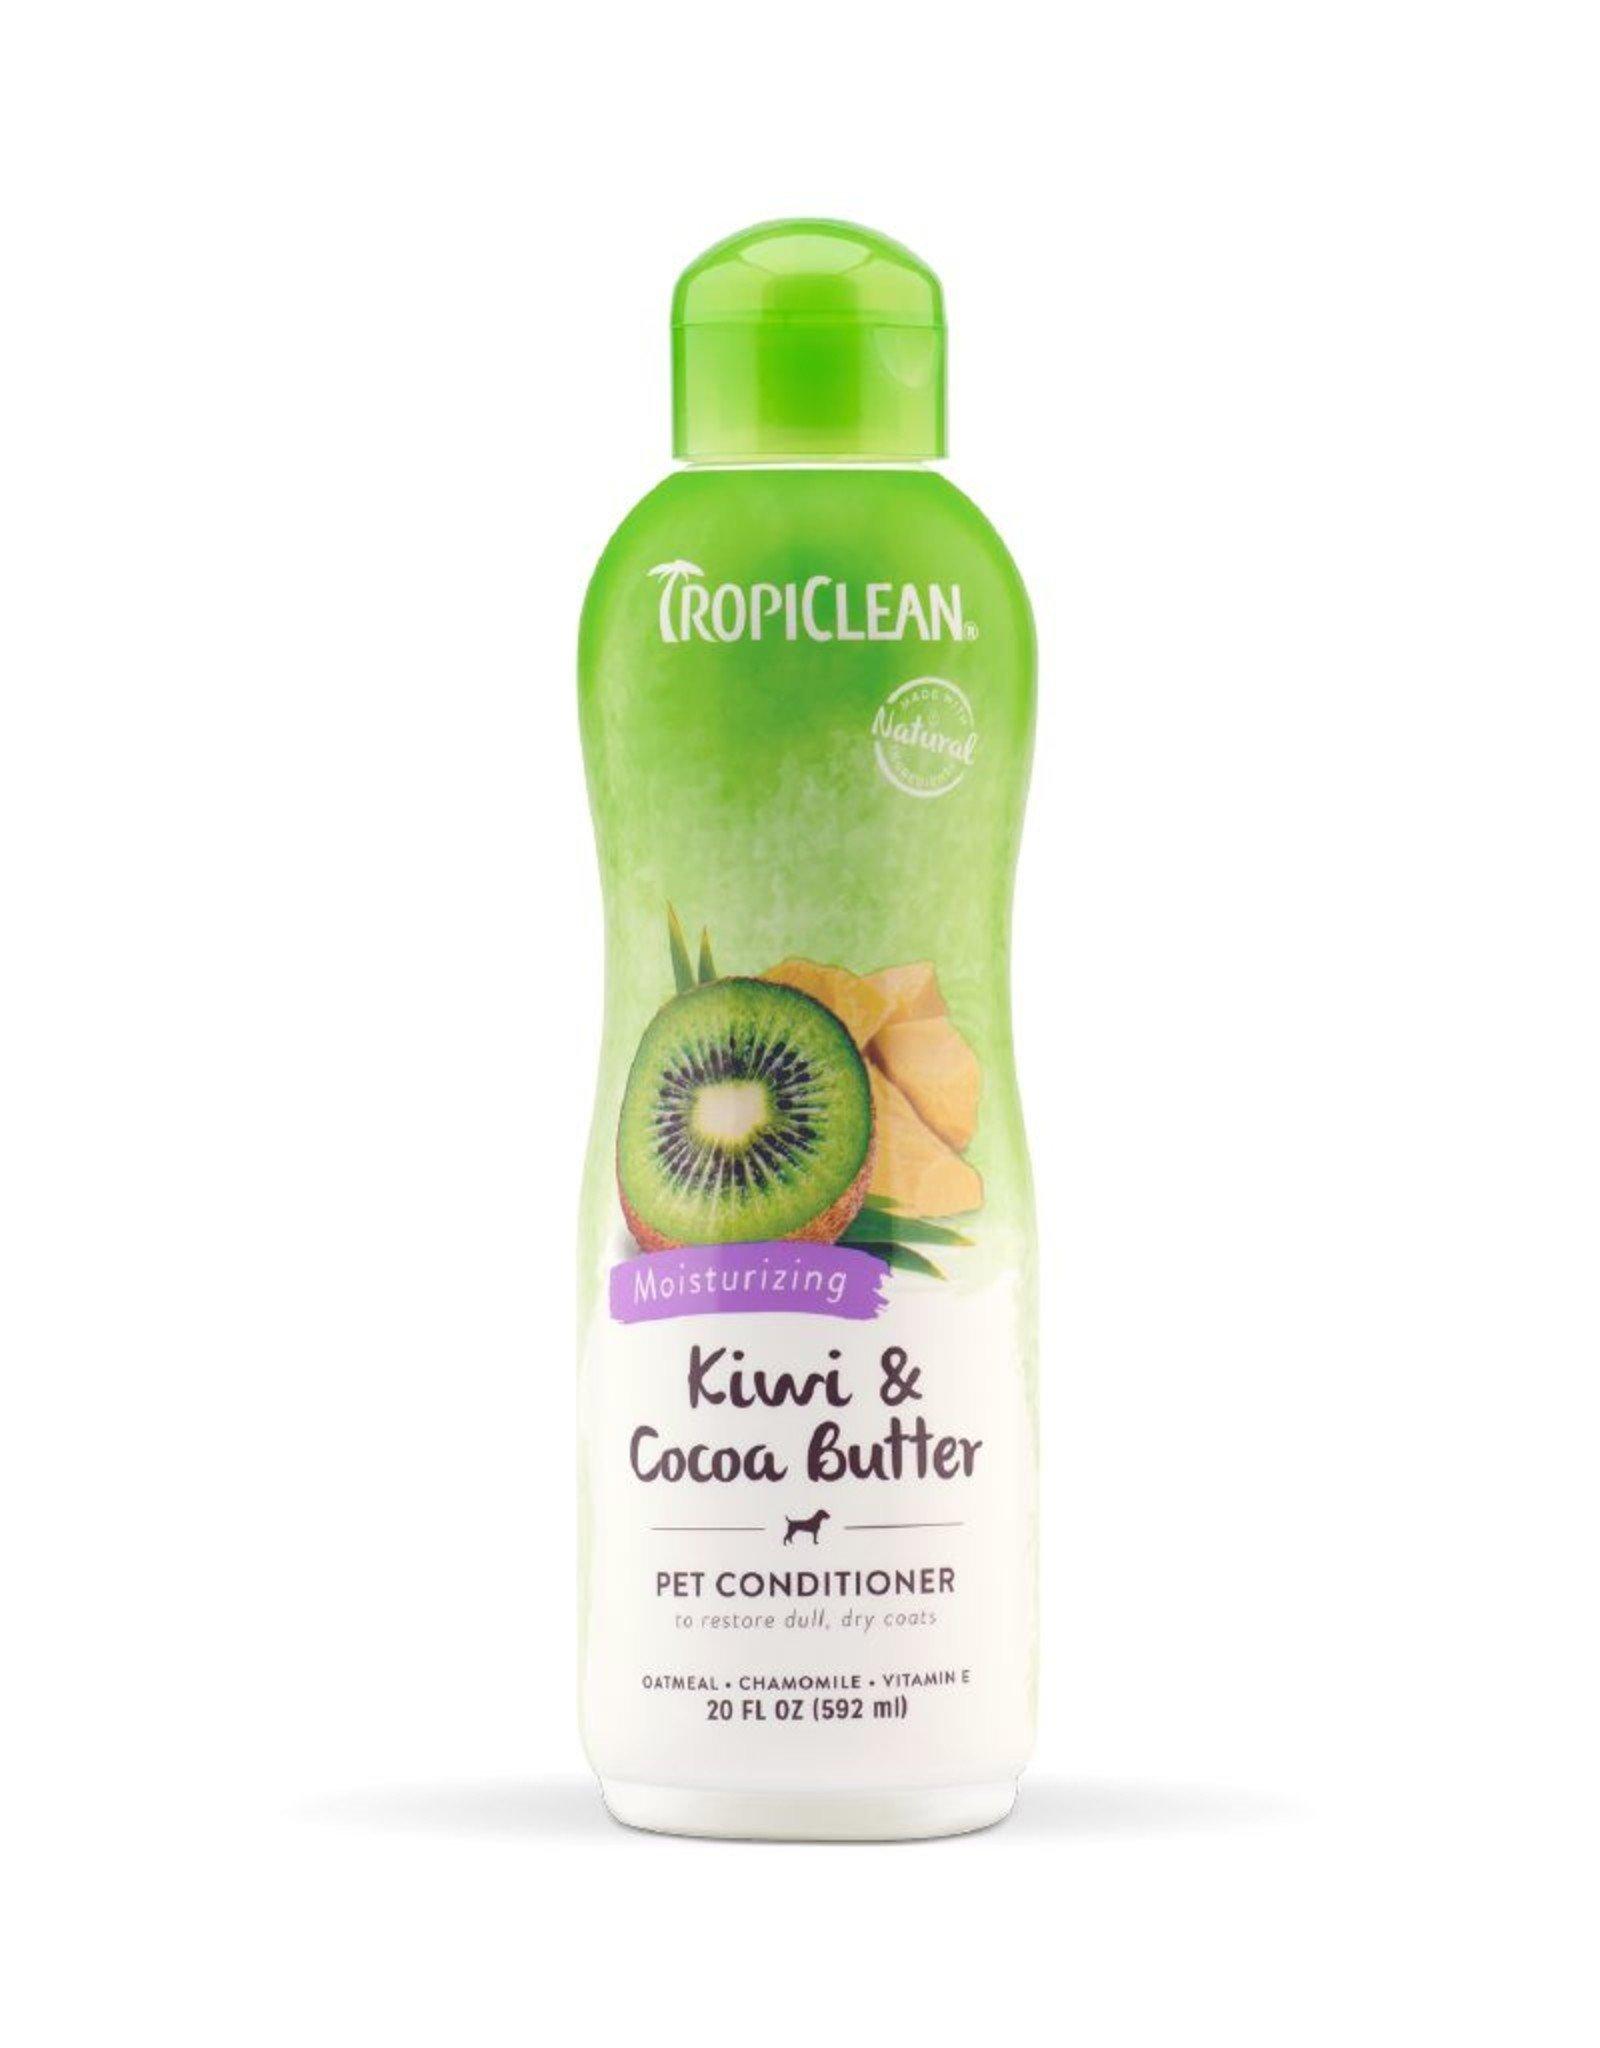 TROPICLEAN TropiClean | Kiwi & Cocoa Butter Pet Conditioner